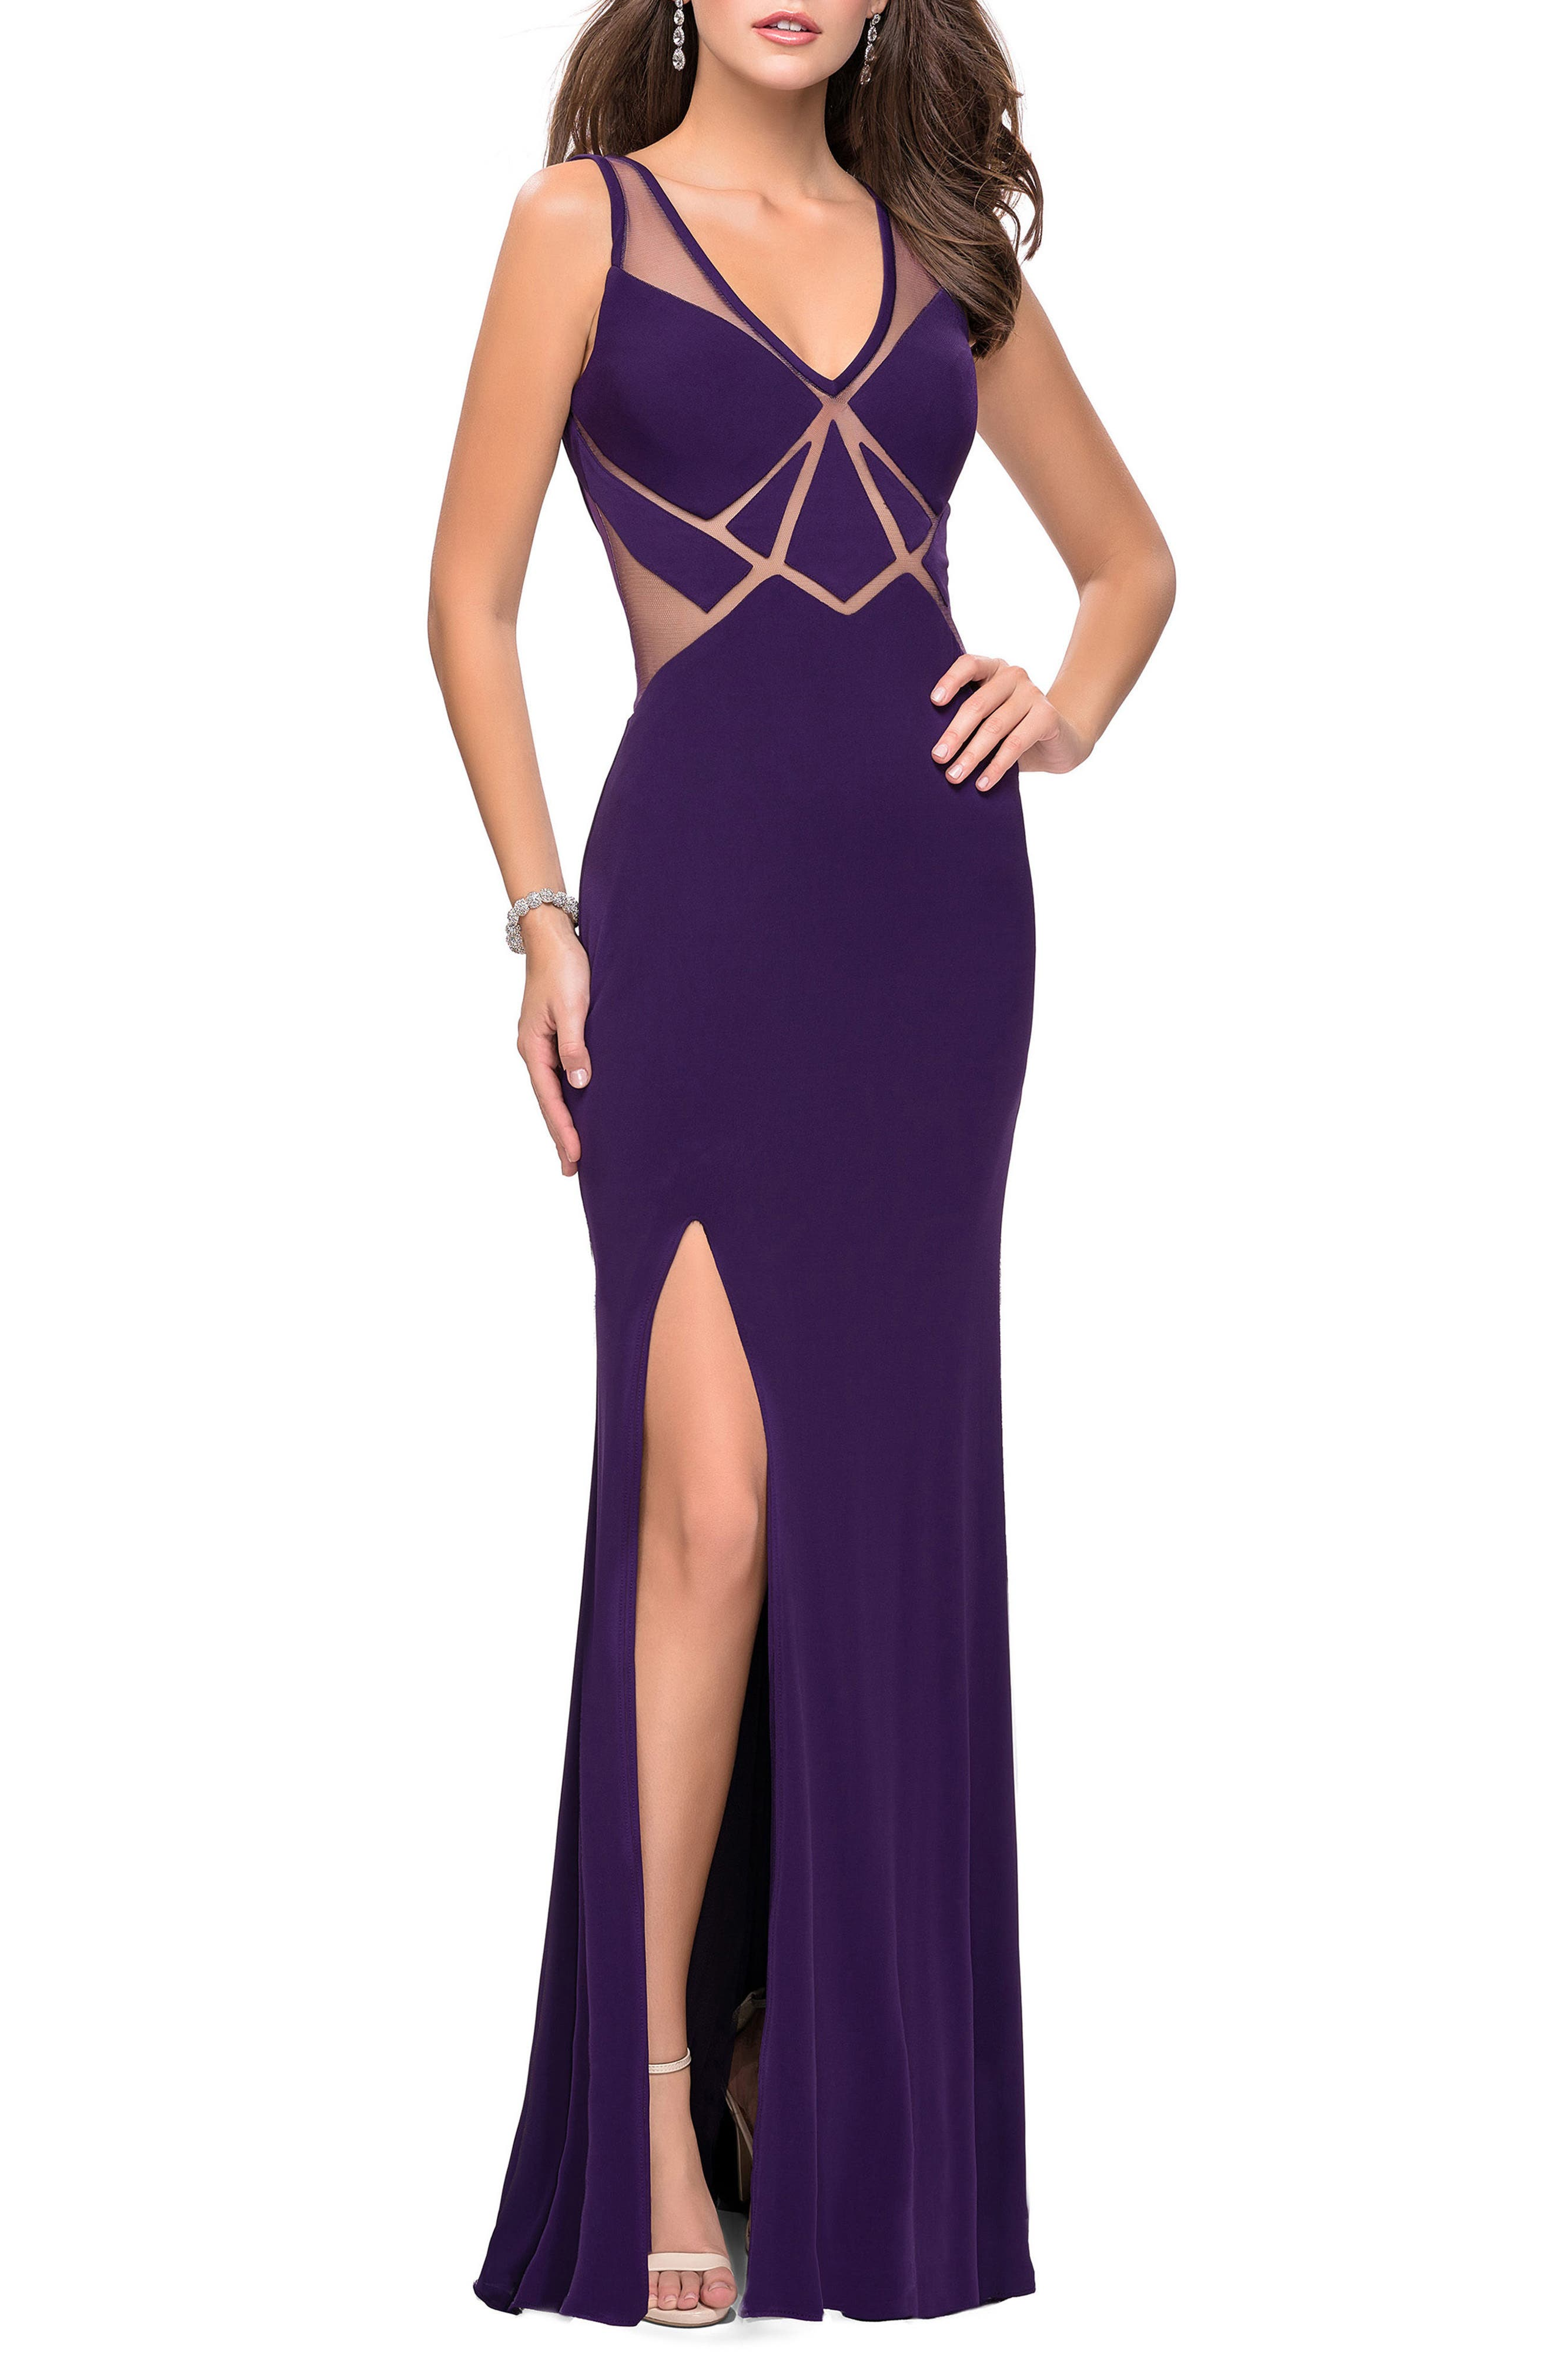 Geometric Cutout Jersey Gown,                             Main thumbnail 1, color,                             Plum